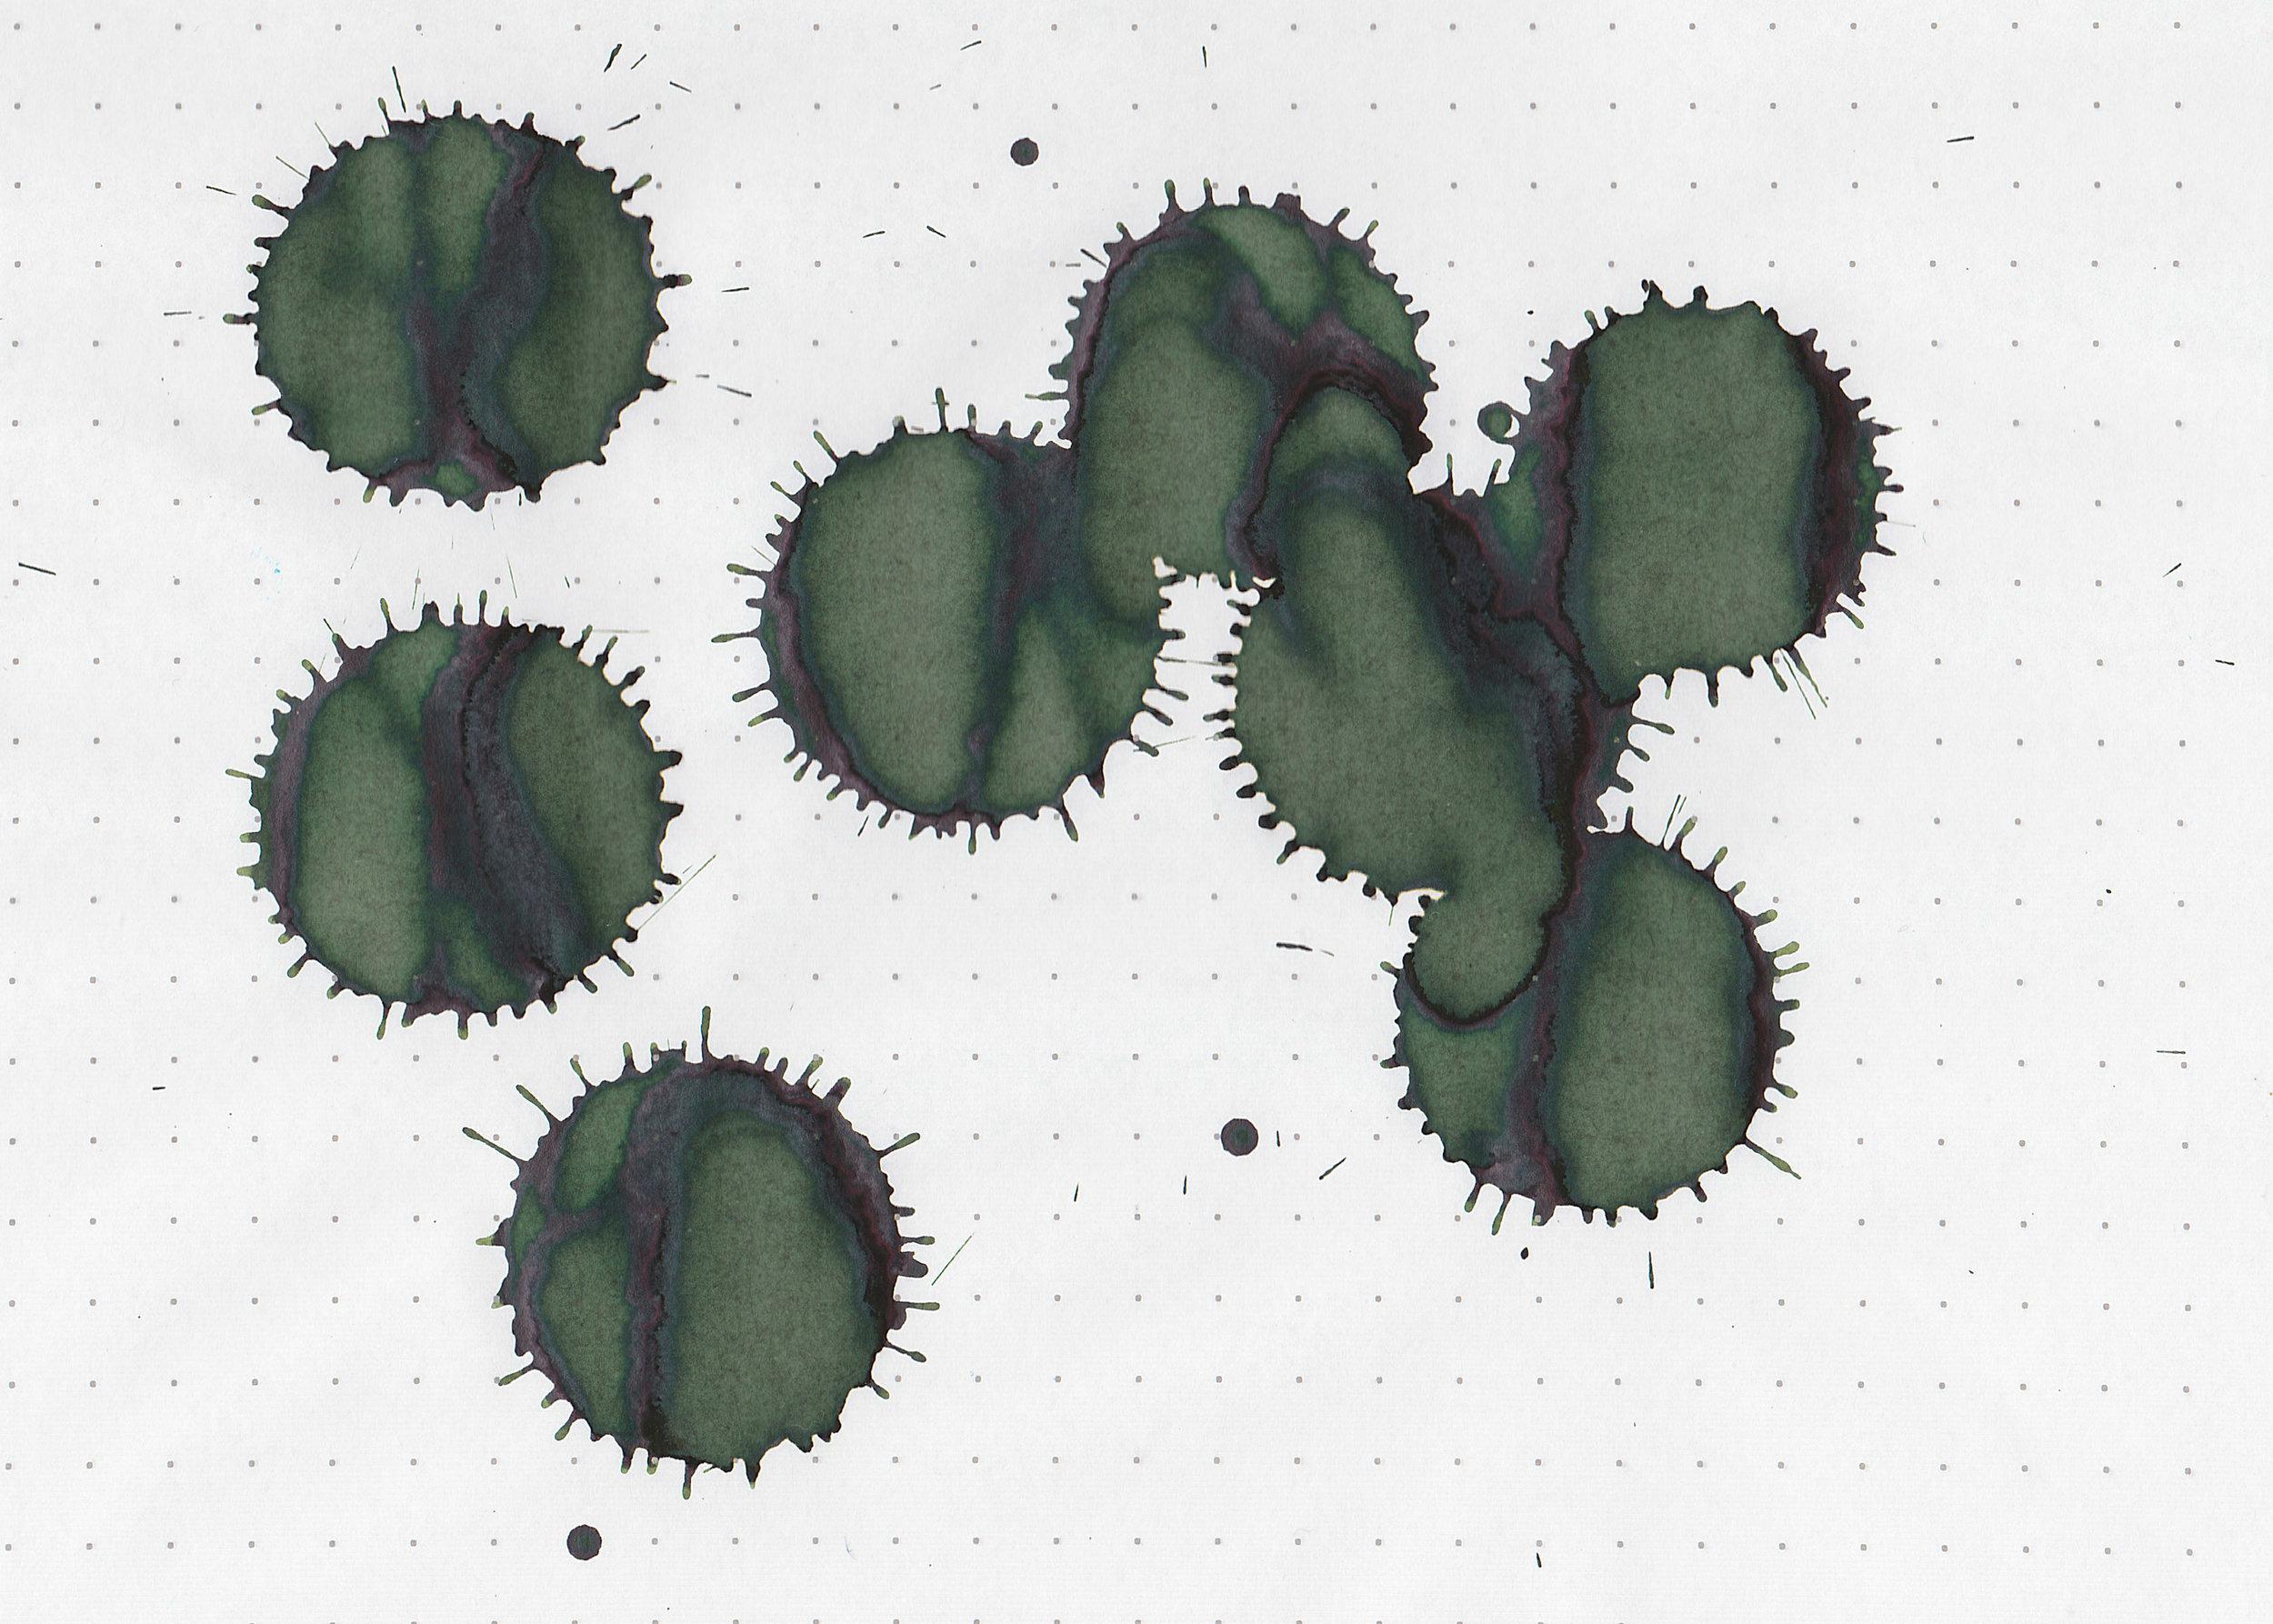 mv-olivine-4.jpg